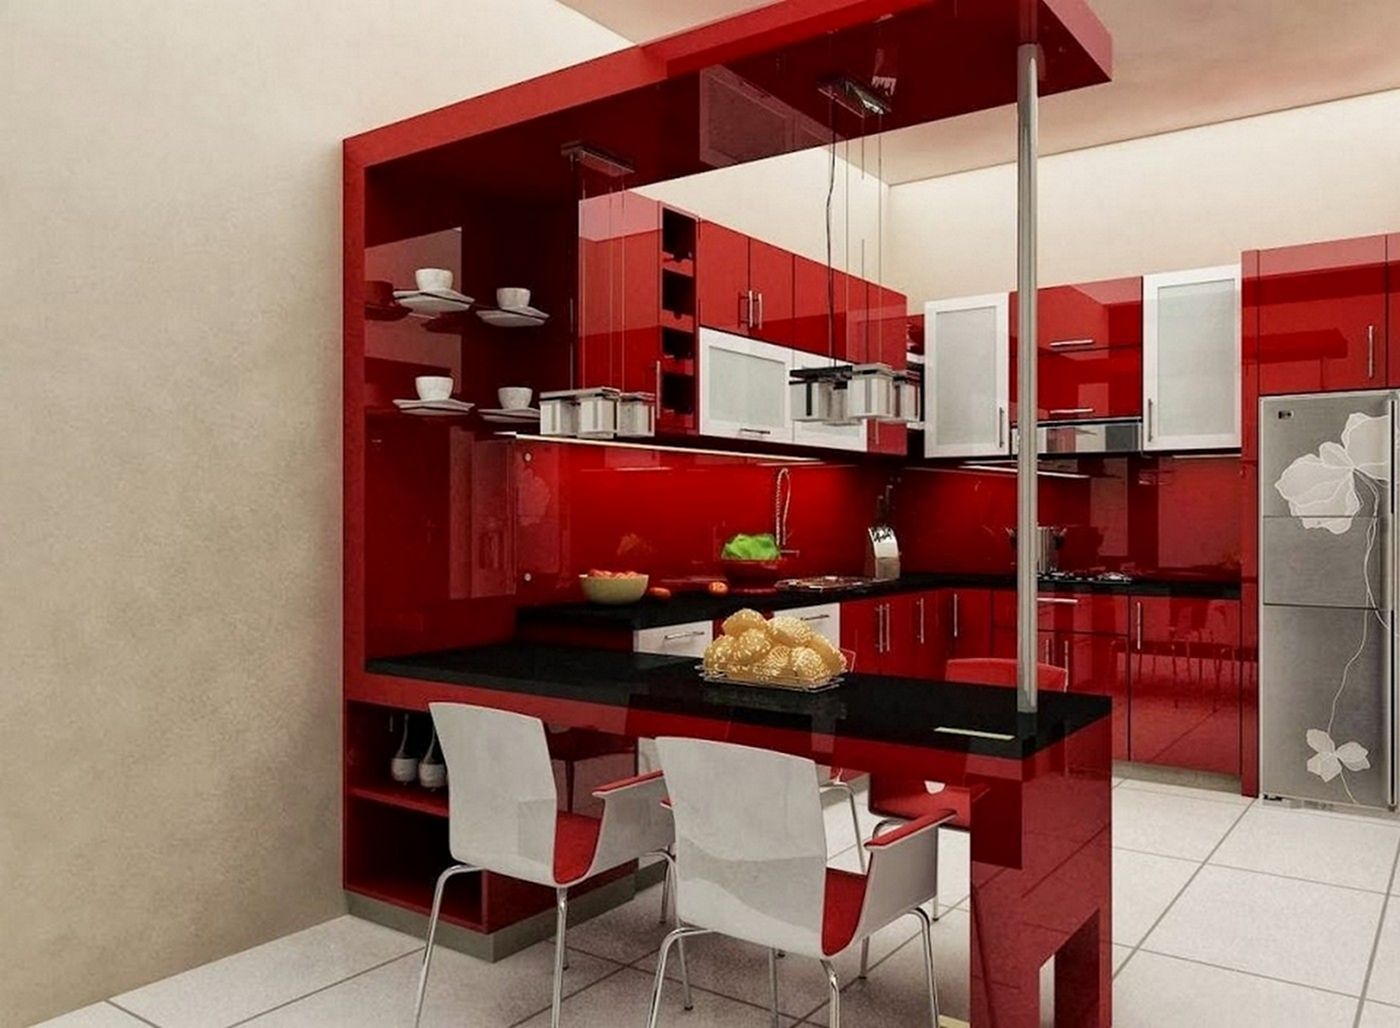 27 Fabulous Home Mini Bar Kitchen Designs For Amazing Kitchen Idea Home Bar Designs Kitchen Bar Design Bar Furniture Design